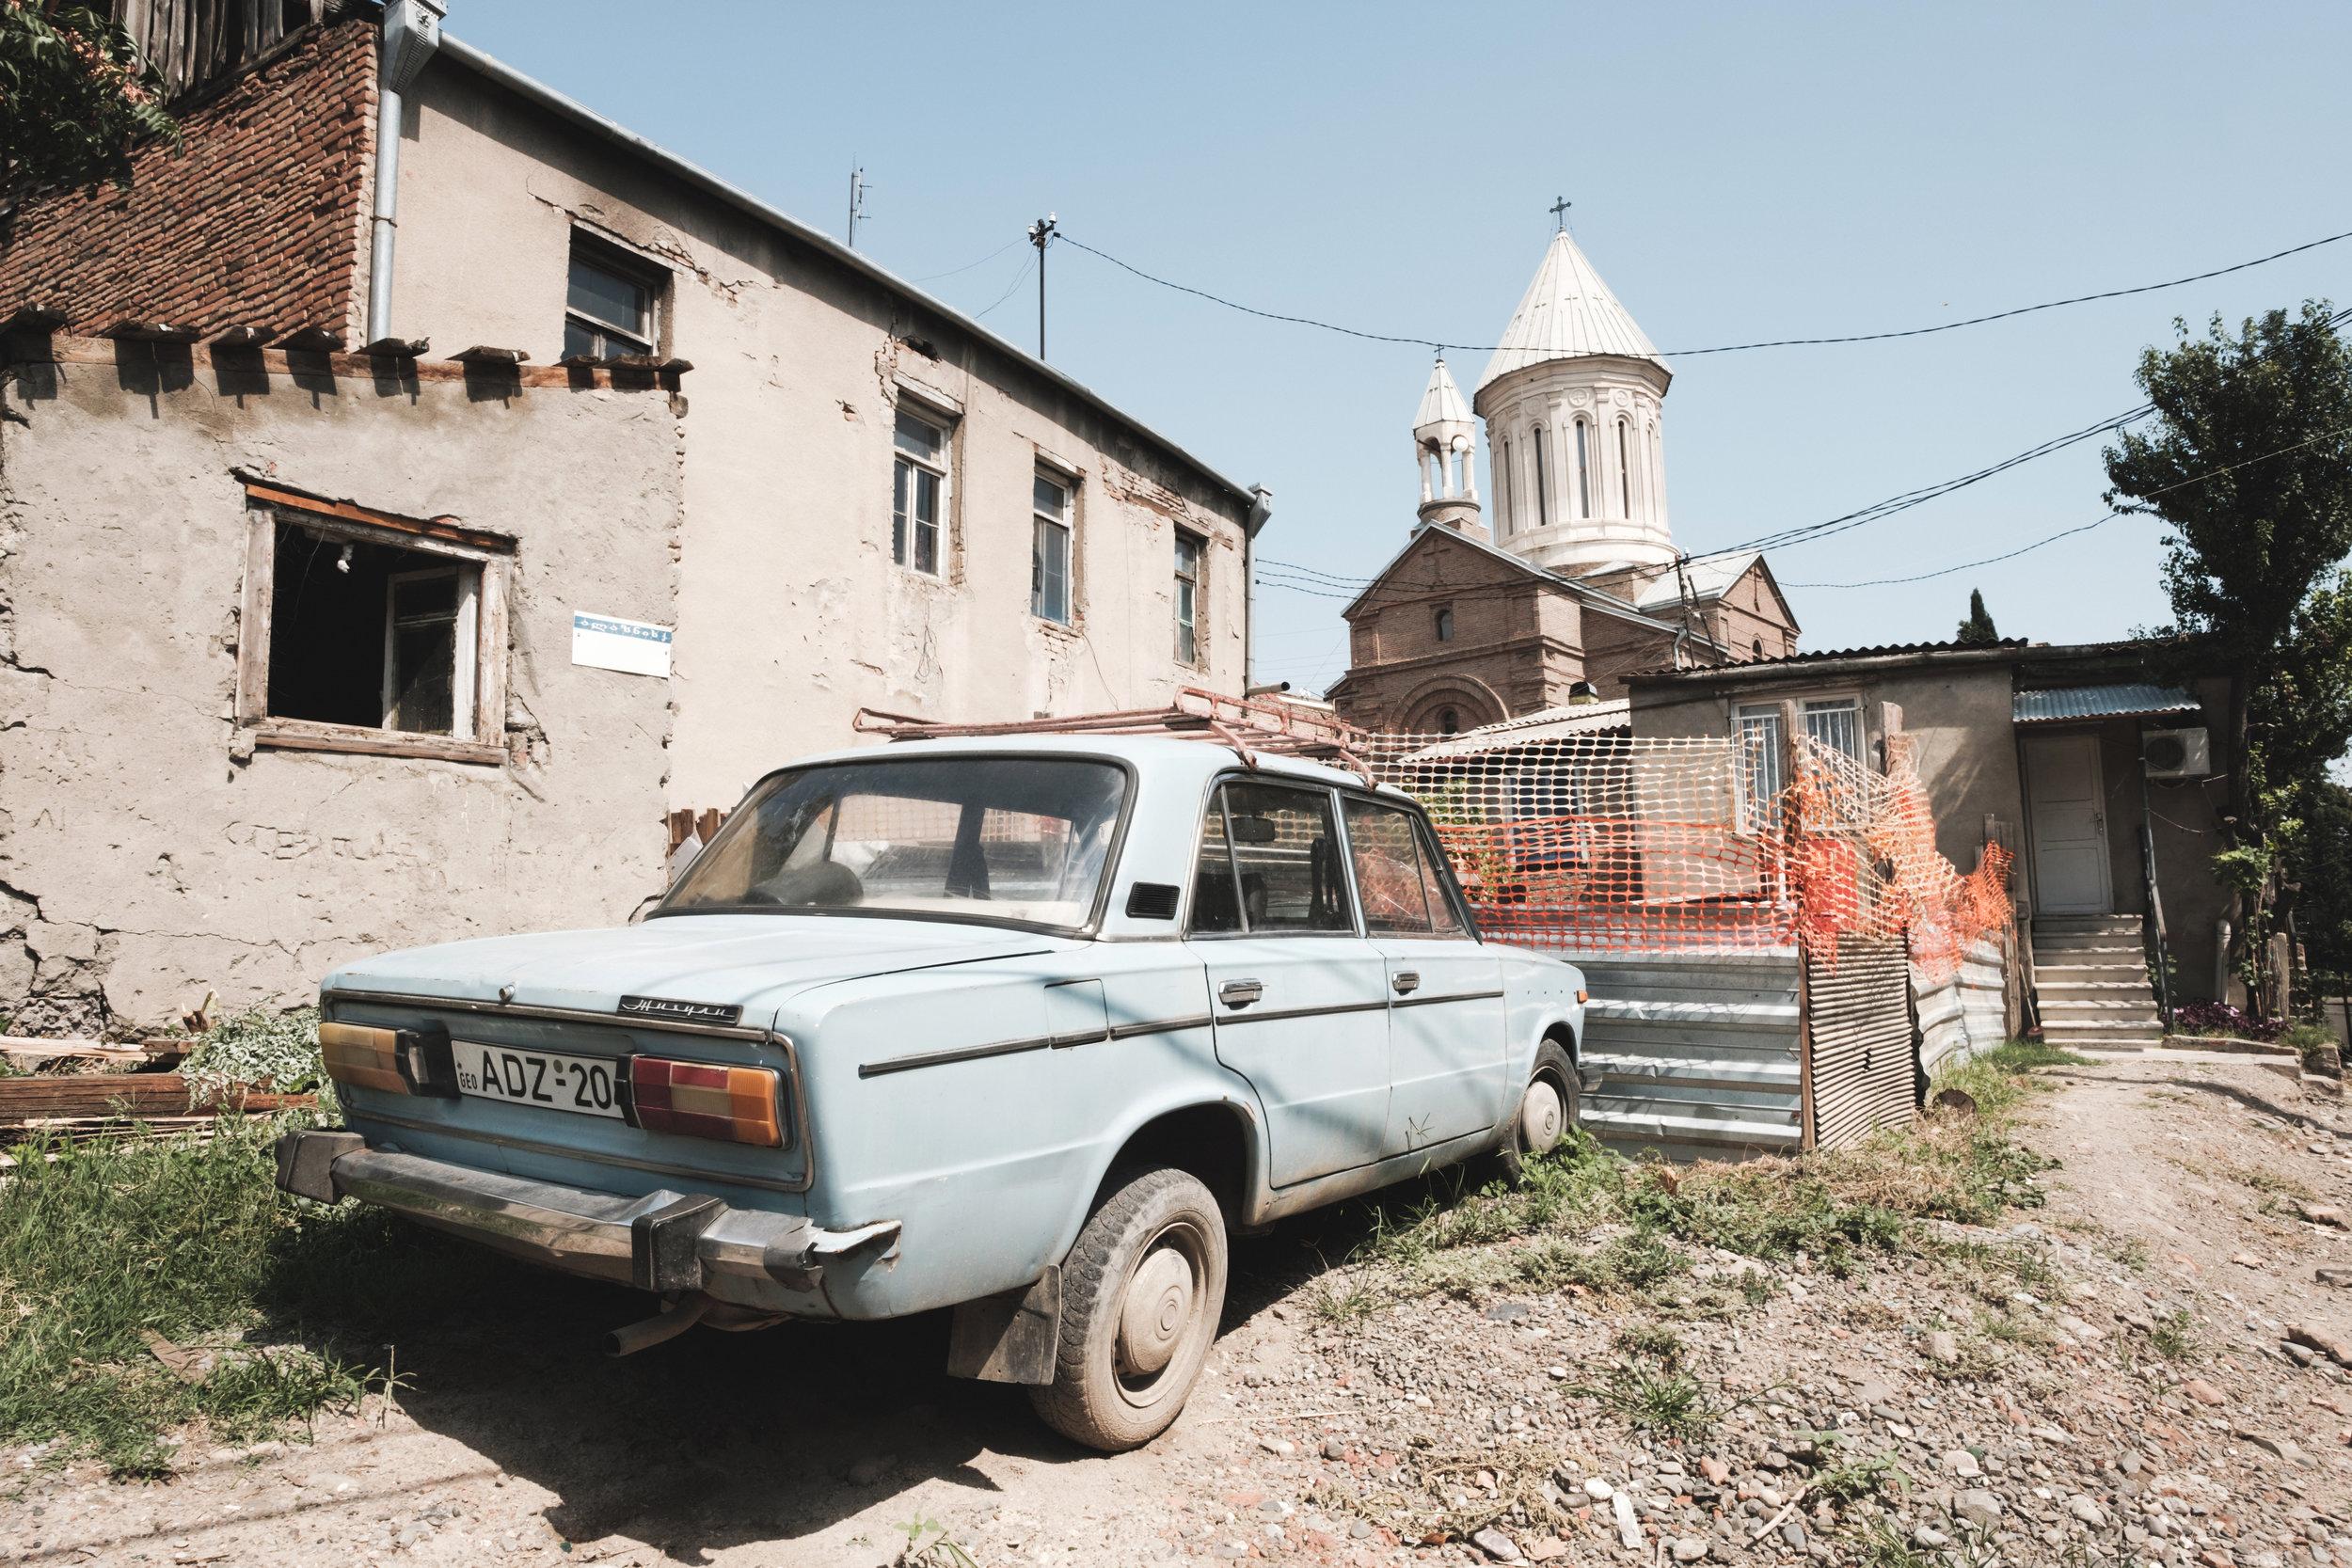 Tbilisi, Georgia , Fujifilm X-Pro2, XF 14mm f/2.8 R @ f/11